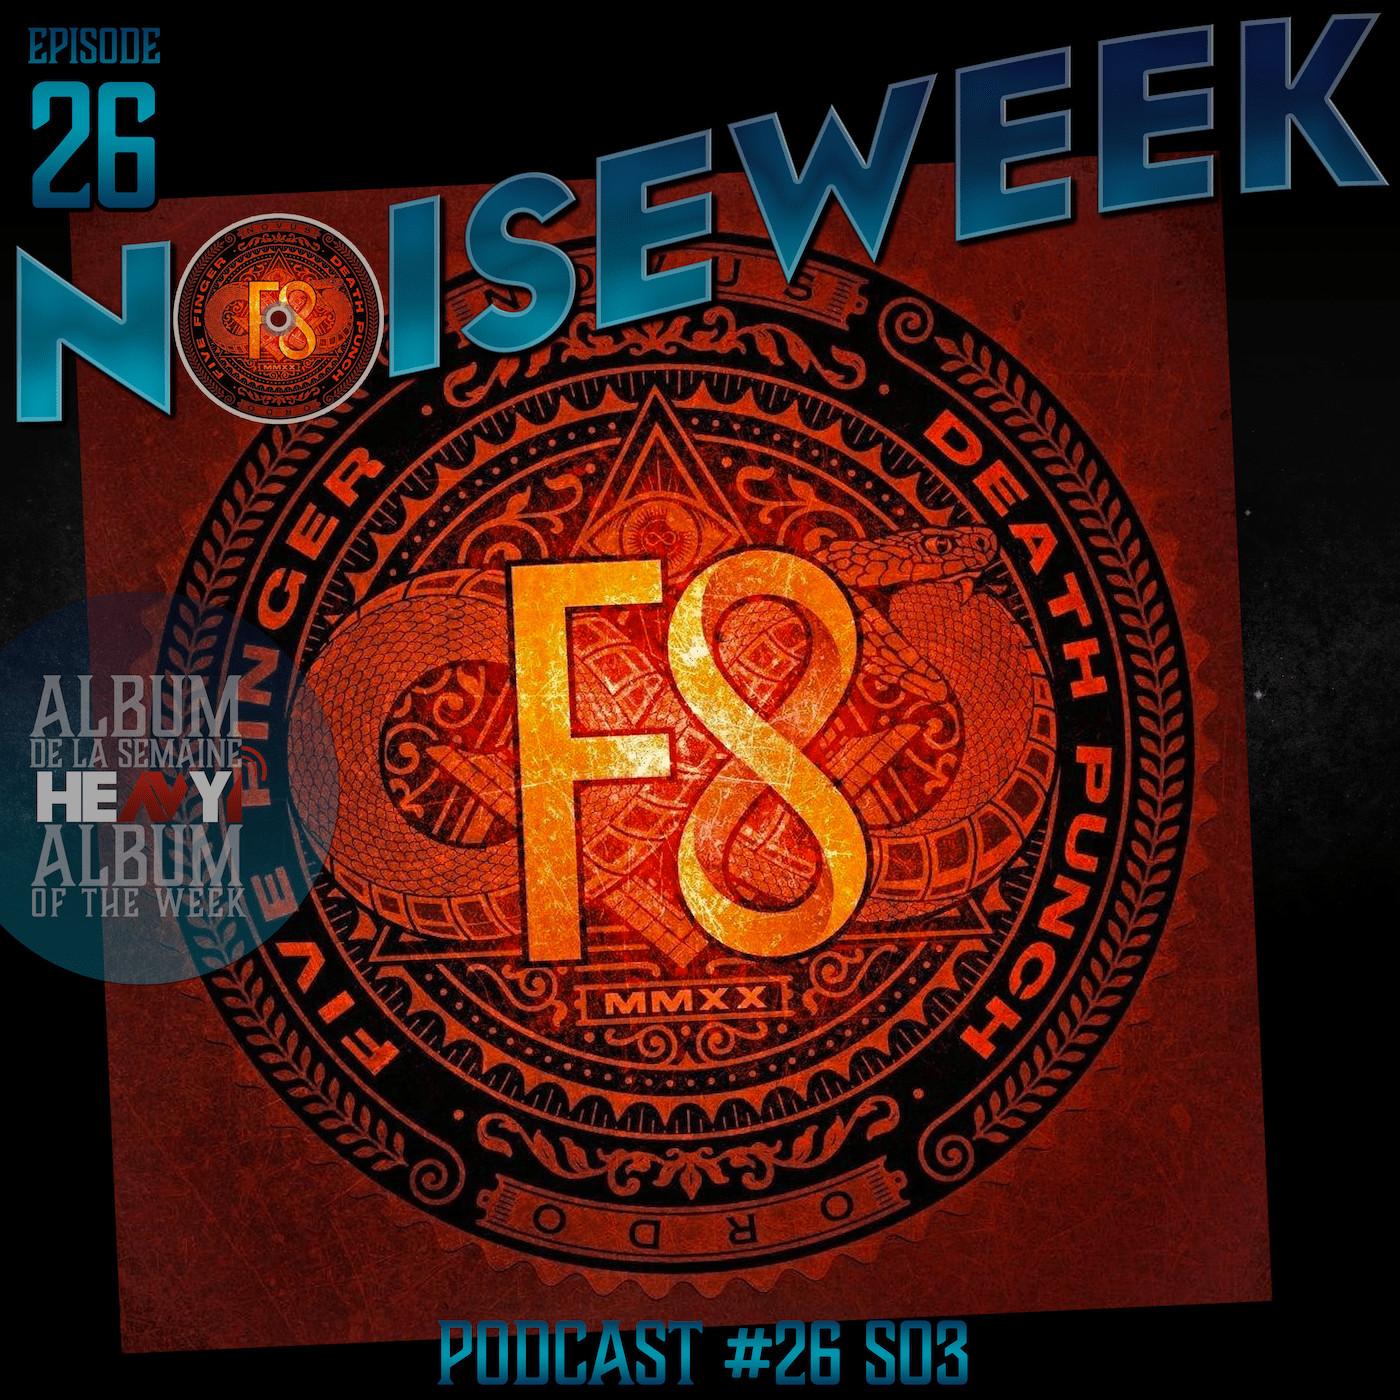 Noiseweek #26 Saison 3